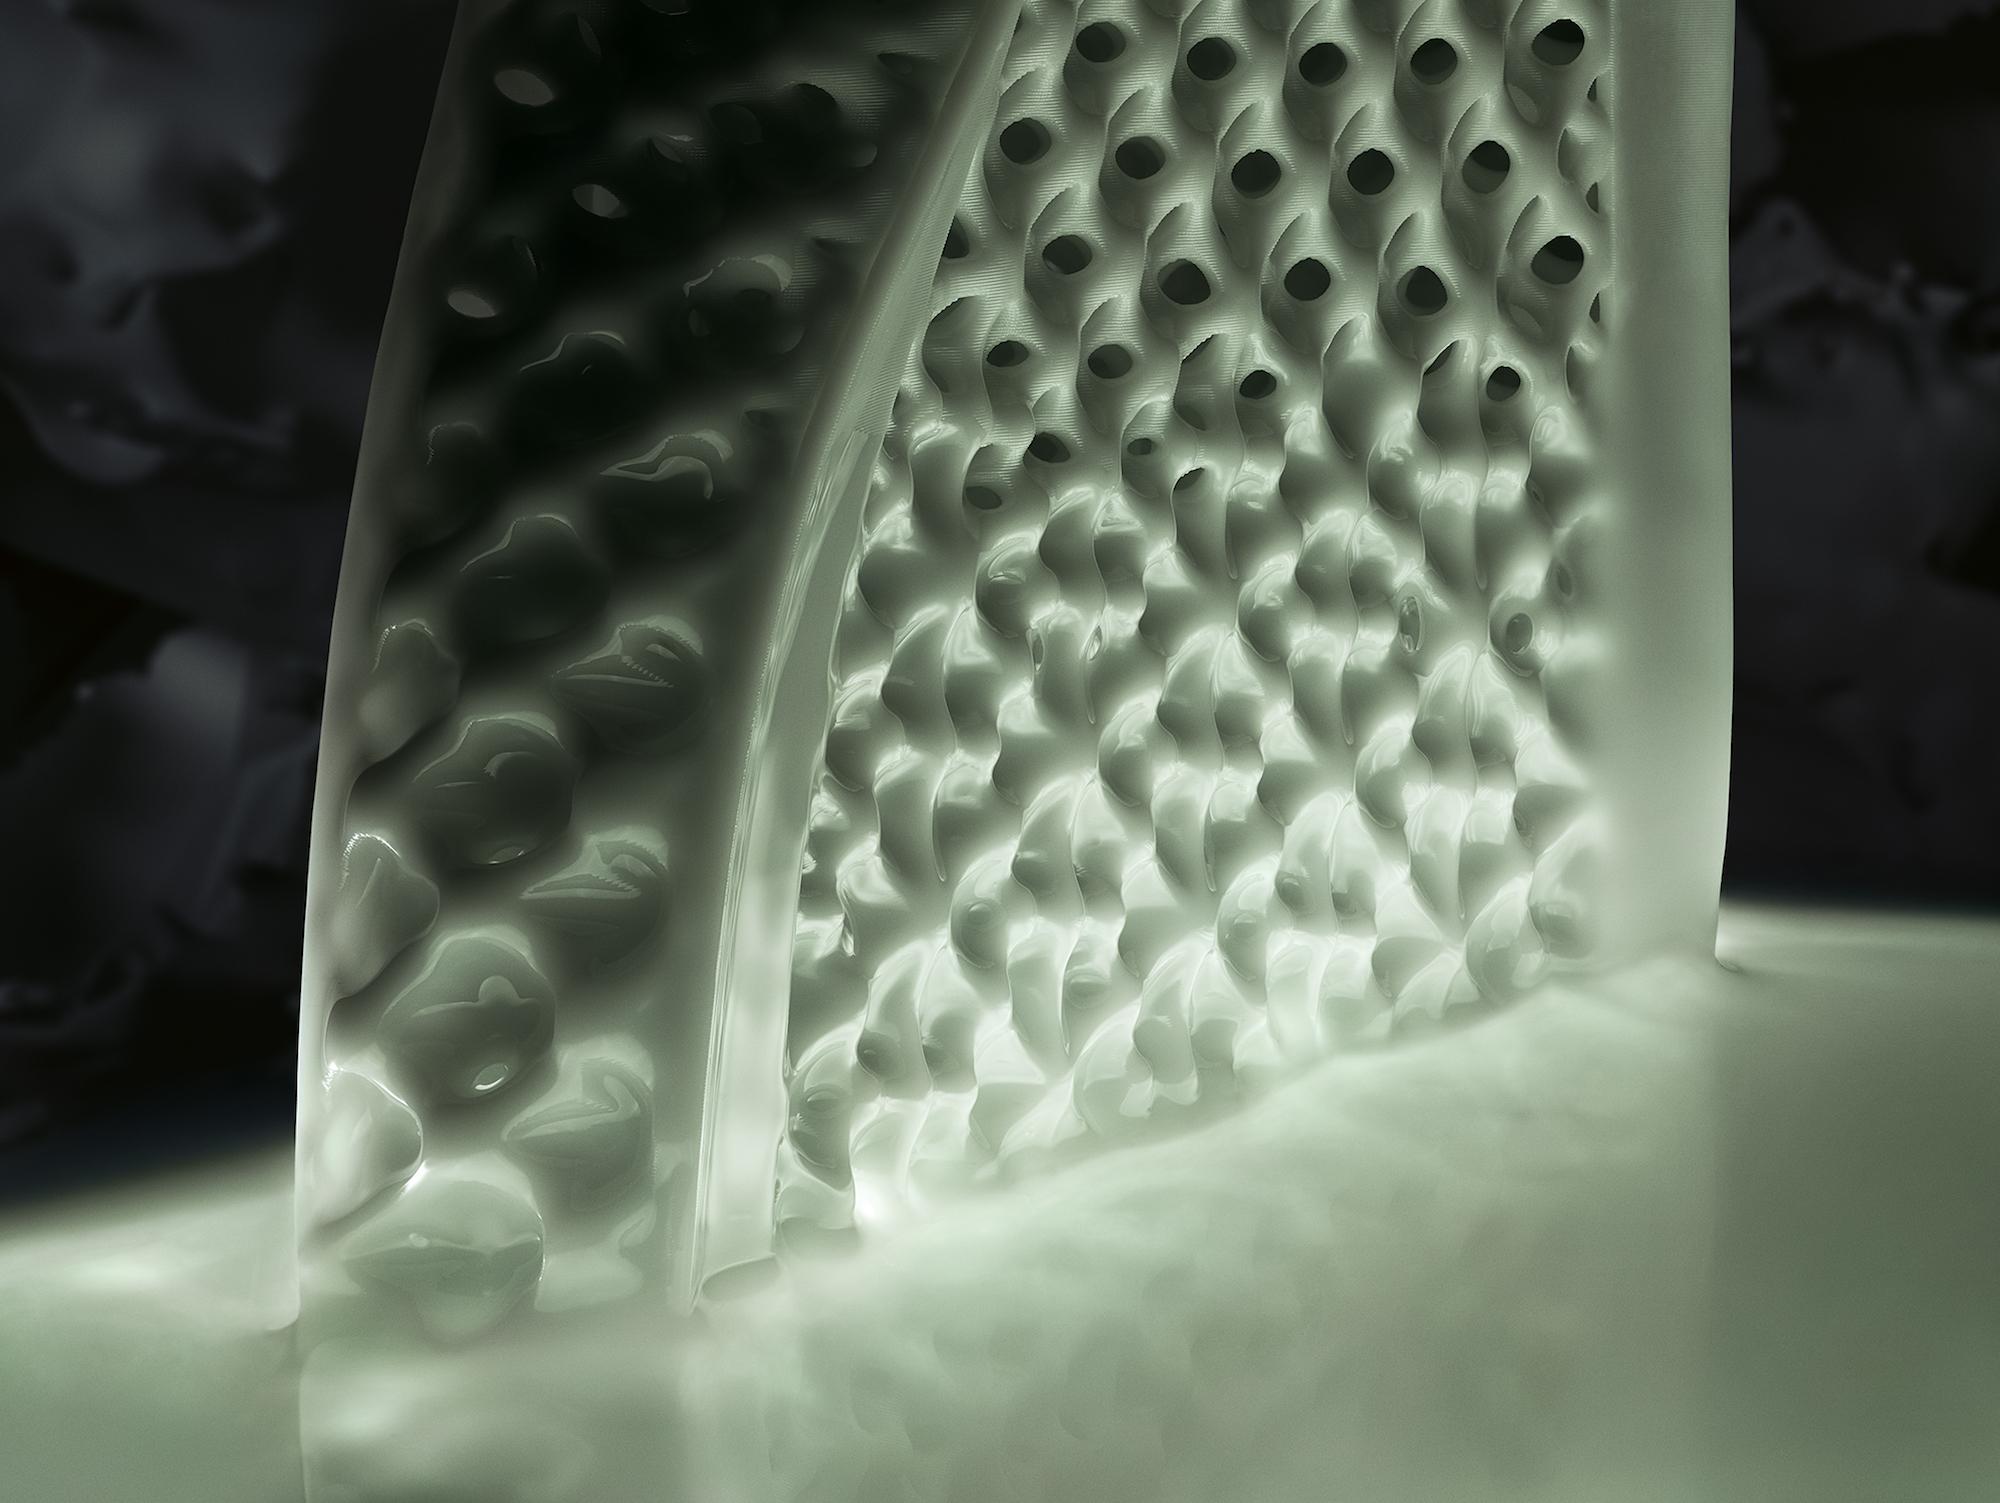 adidas futurecraft 4d carbon digital light synthesis 10